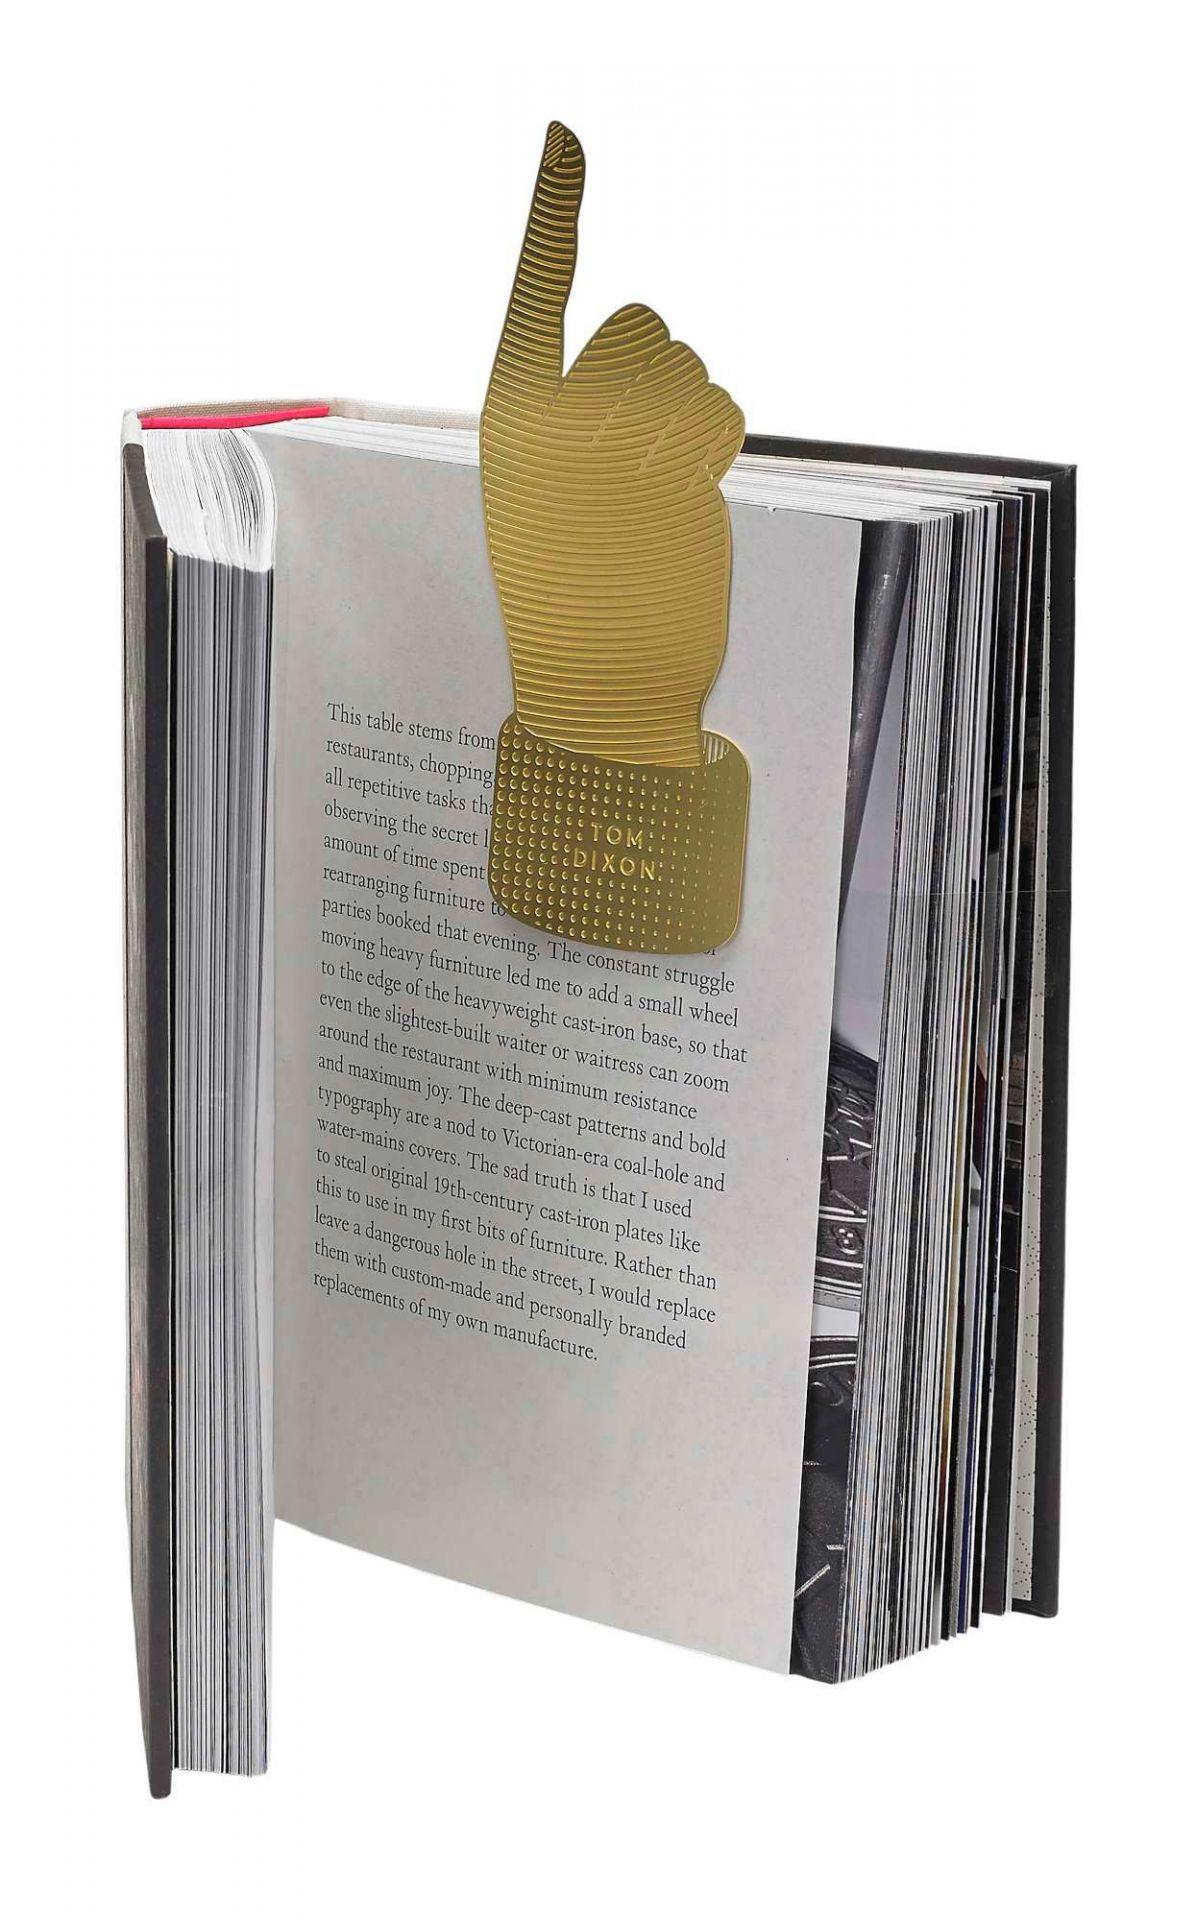 Tool the Bookworm Hand Lesezeichen Hand Tom Dixon